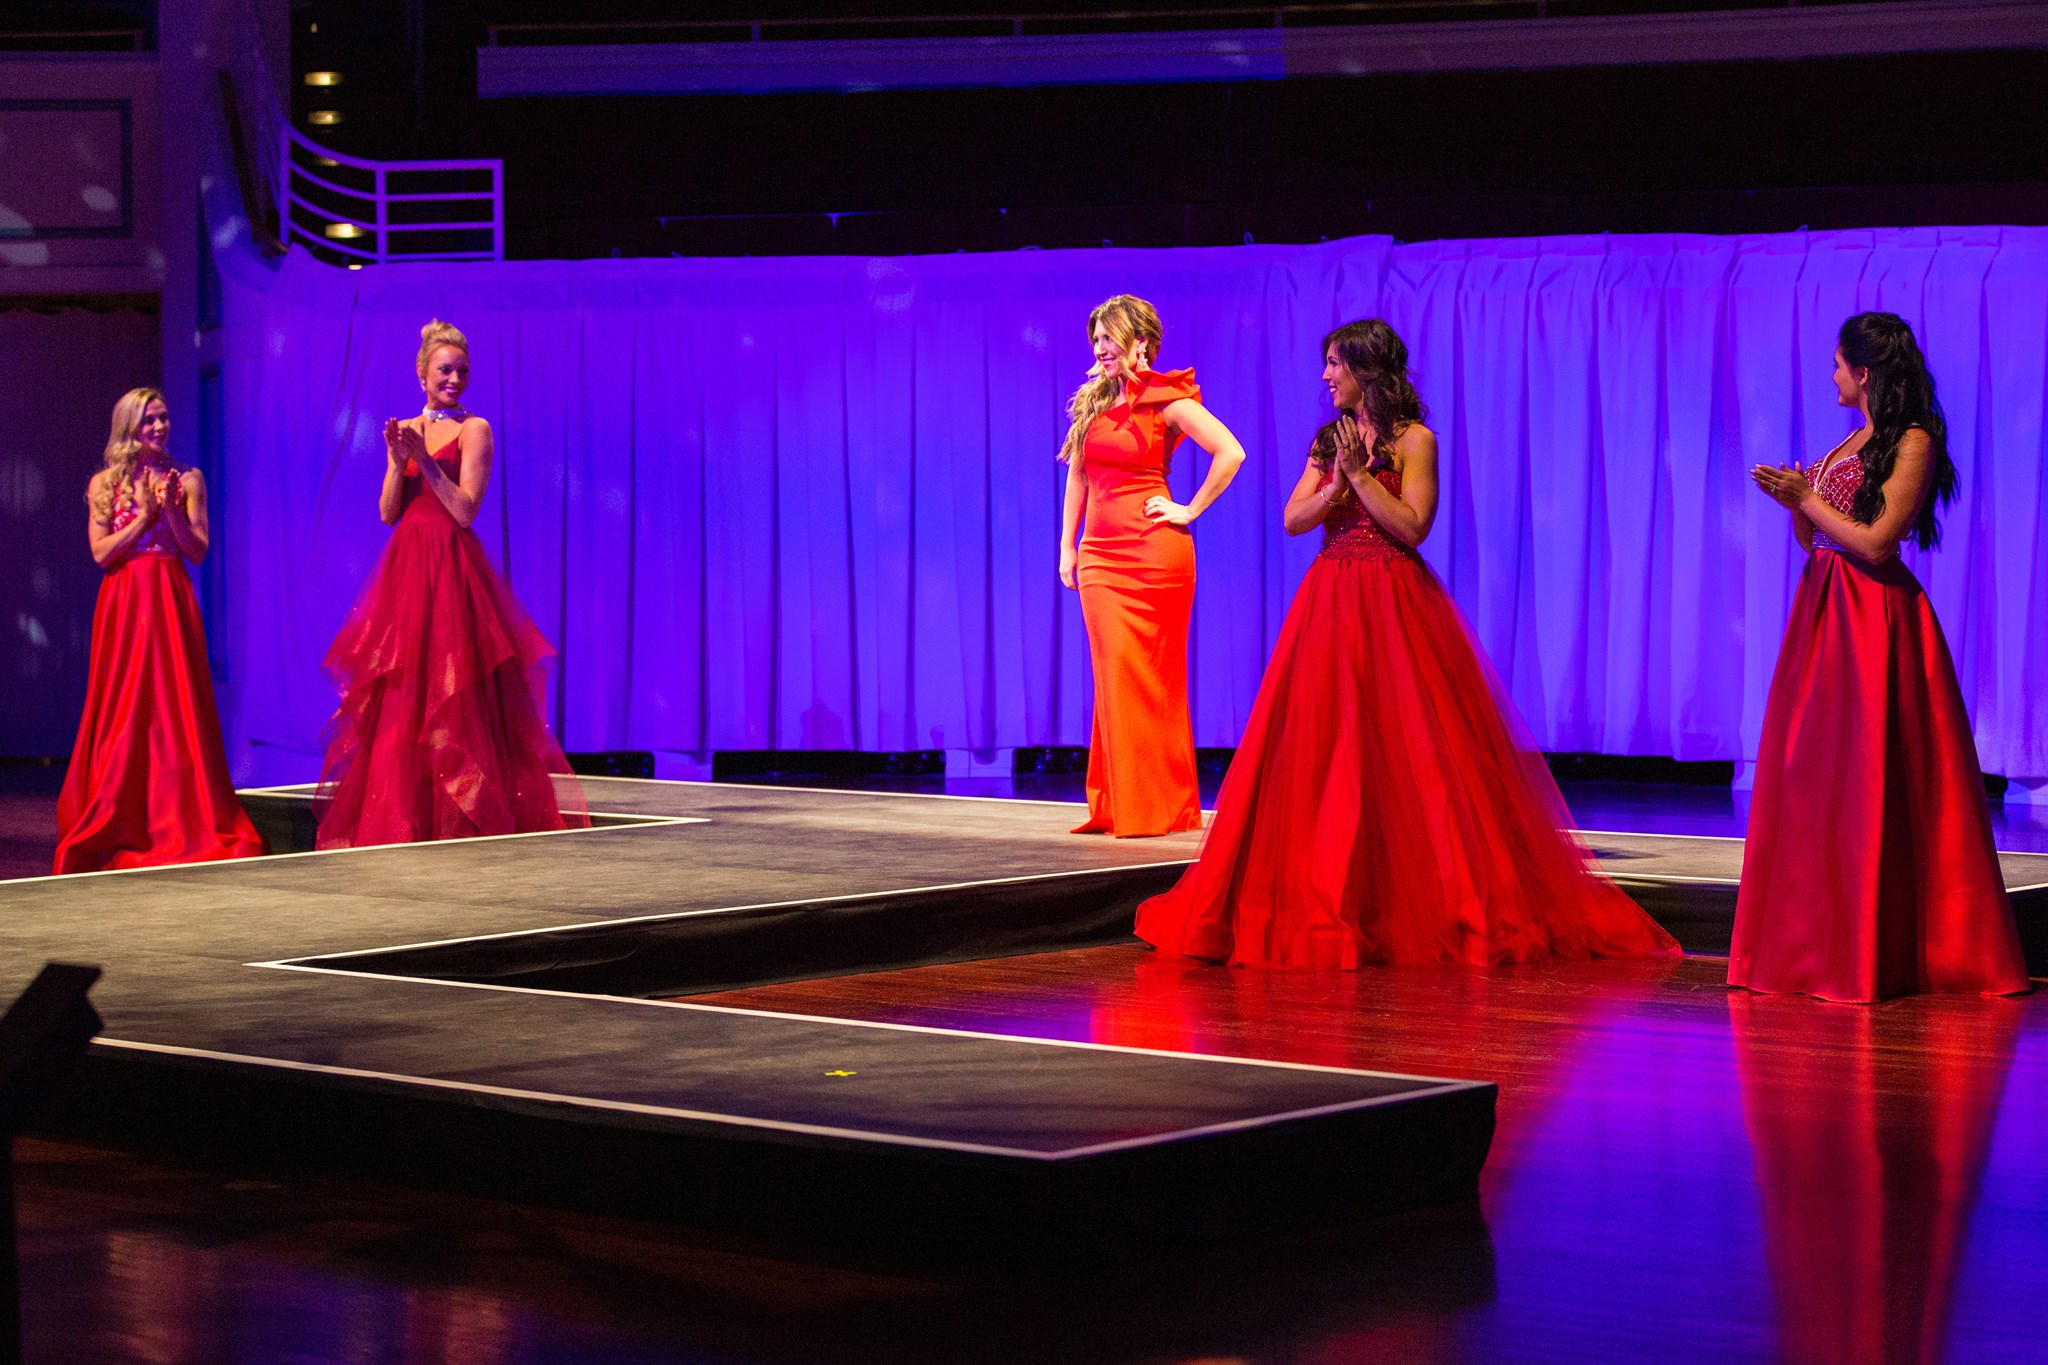 Red dress fashion show